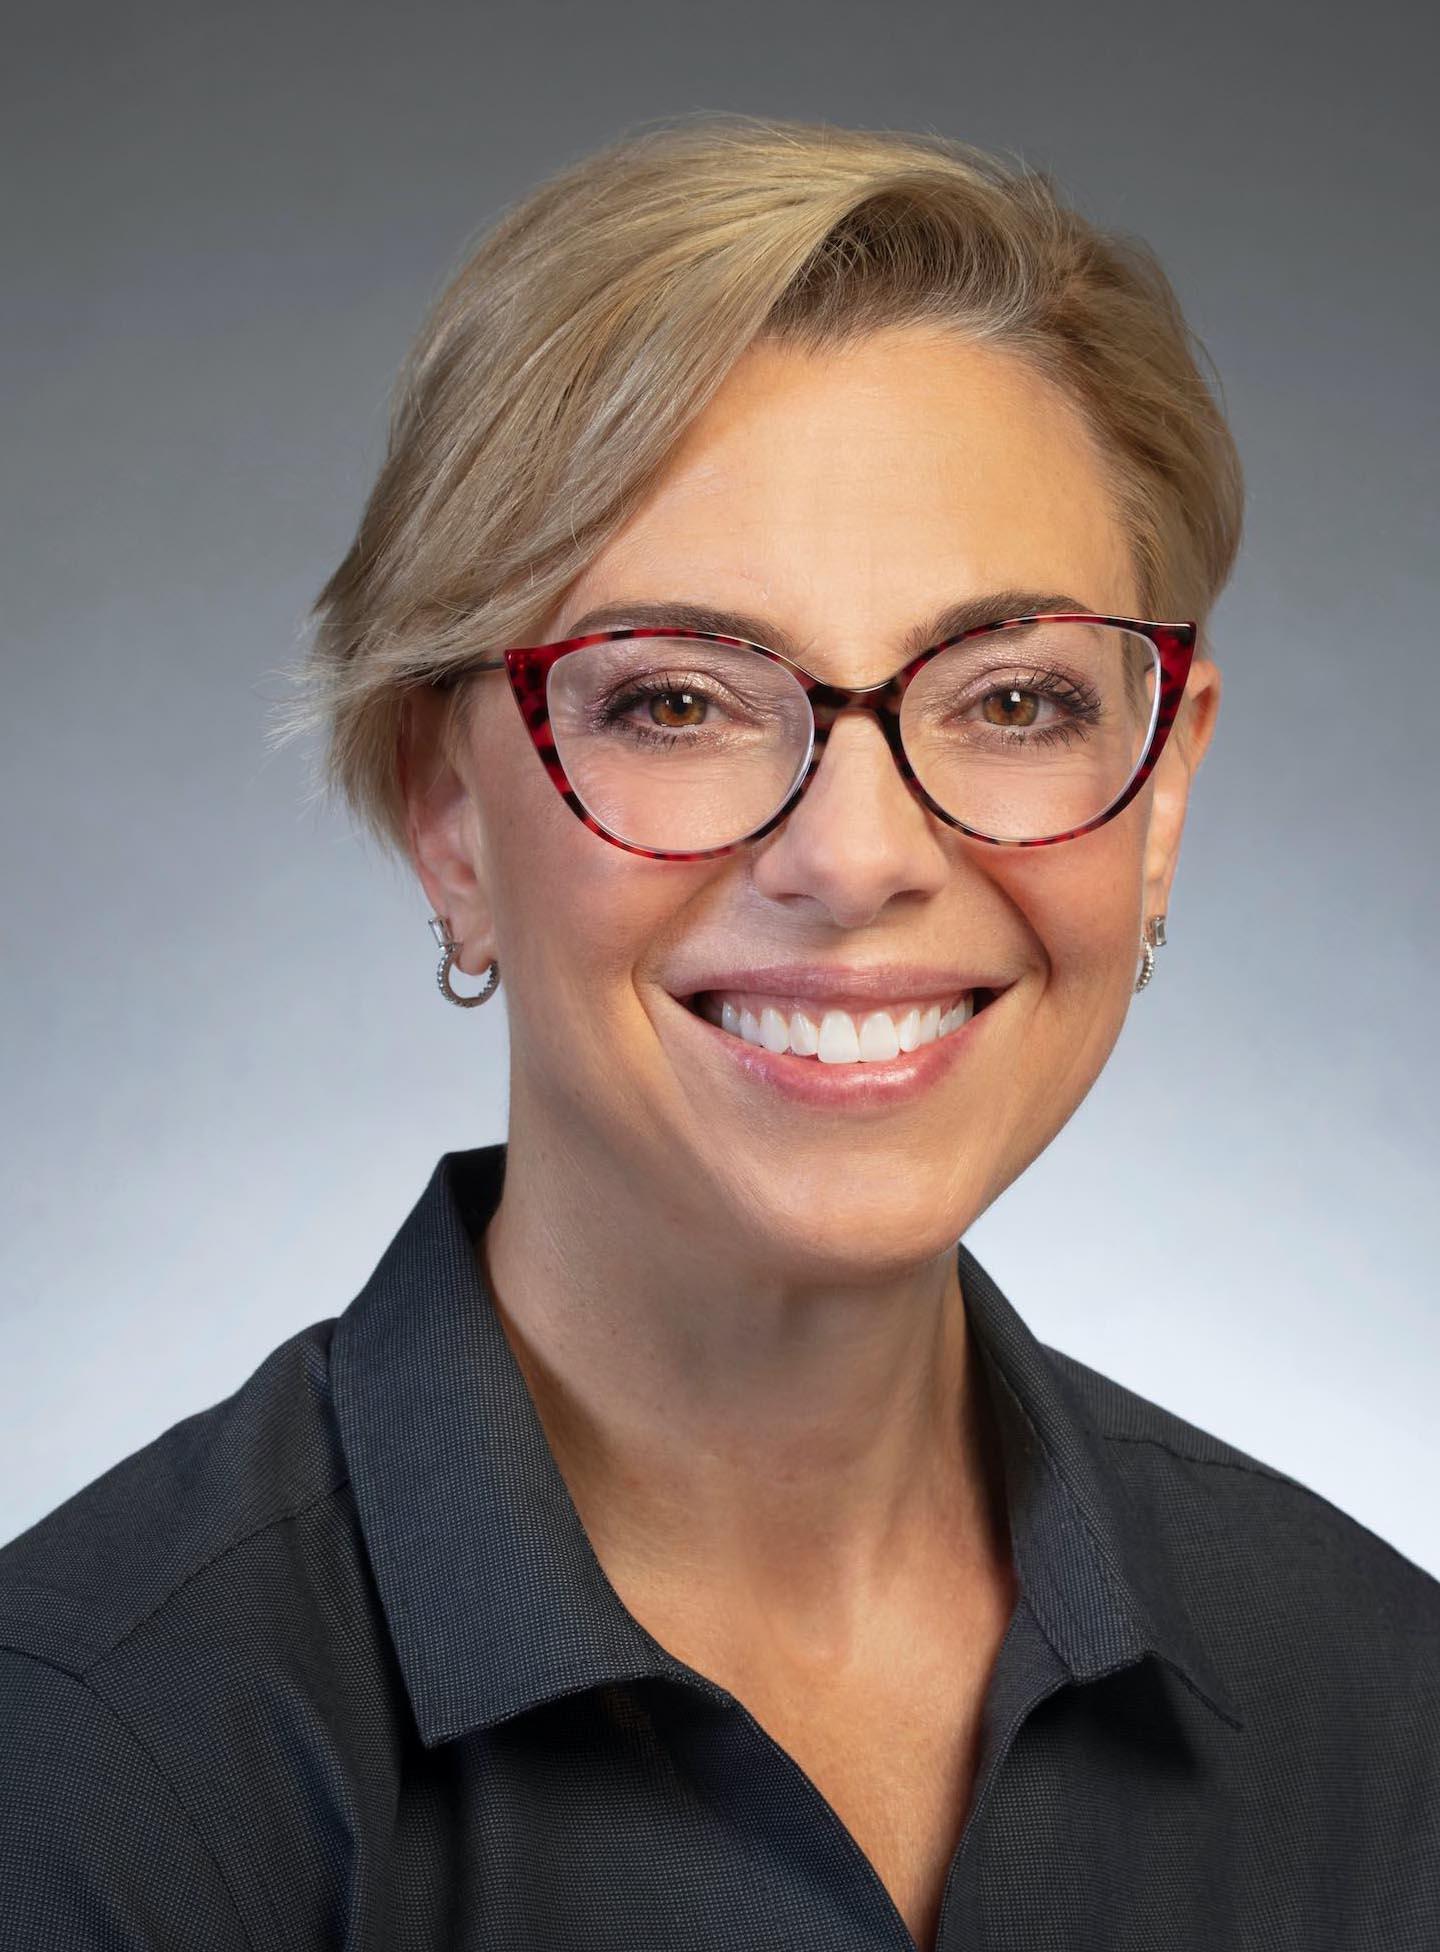 Jennifer Galligane